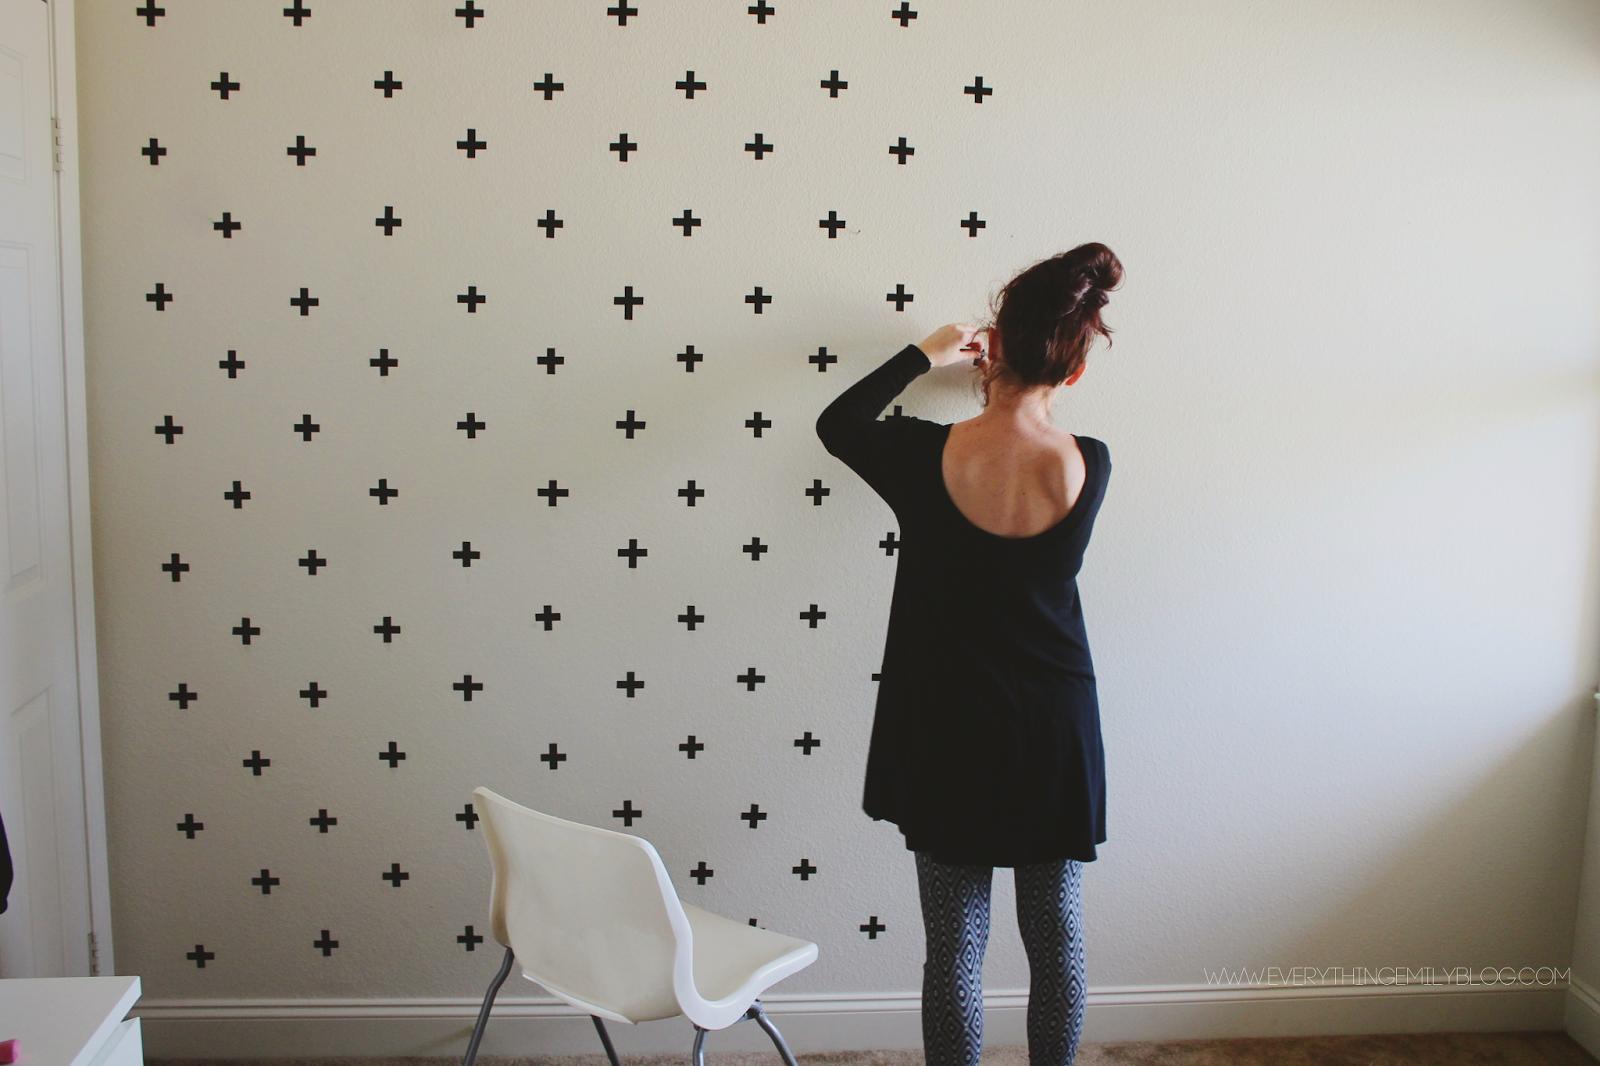 Dorm Room Decor 101: Washi Tape Wall Art - Blinds.com | Washi tape ...